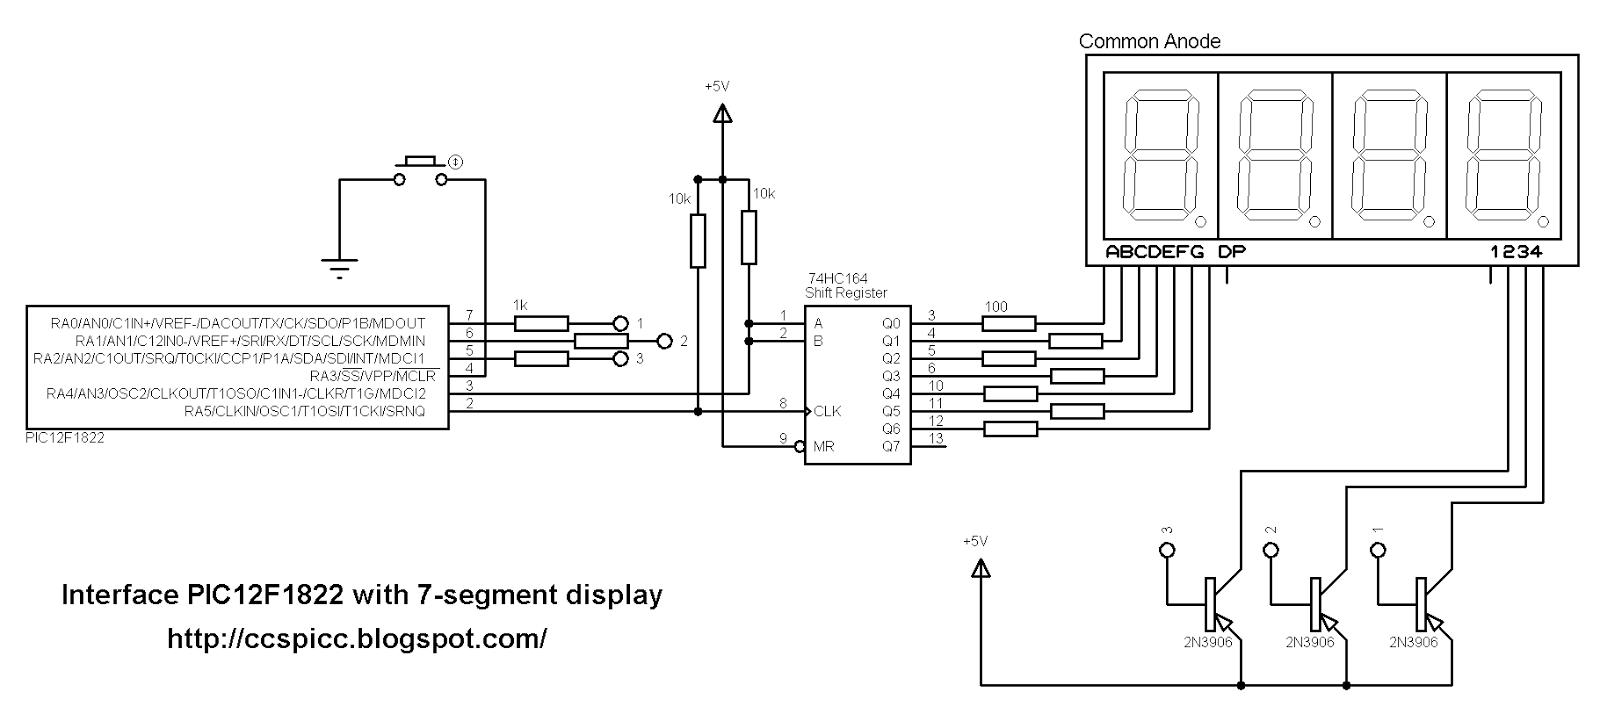 Interfacing 7-segment display with PIC12F1822 using CCS